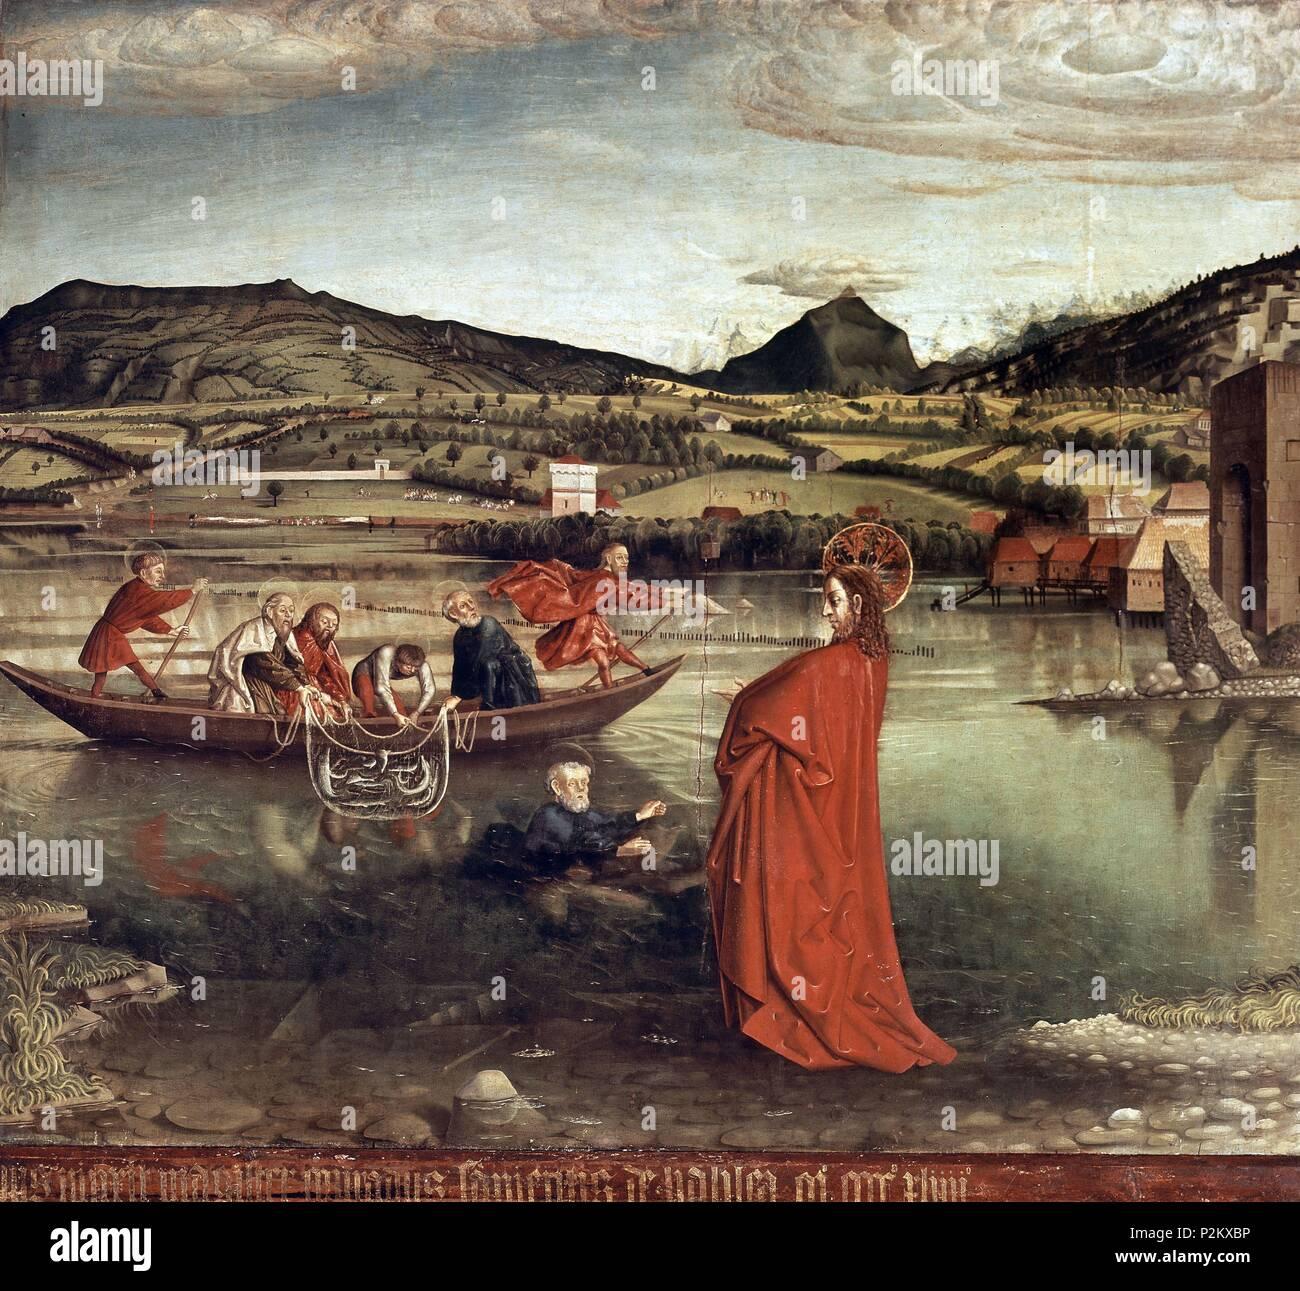 LA PESCA MILAGROSA-MILAGRO DE JESUS. Author: Konrad Witz (c. 1400-c. 1446). Location: MUSEO DE ARTE E HISTORIA, GENÈVE, SWITZERLAND. - Stock Image